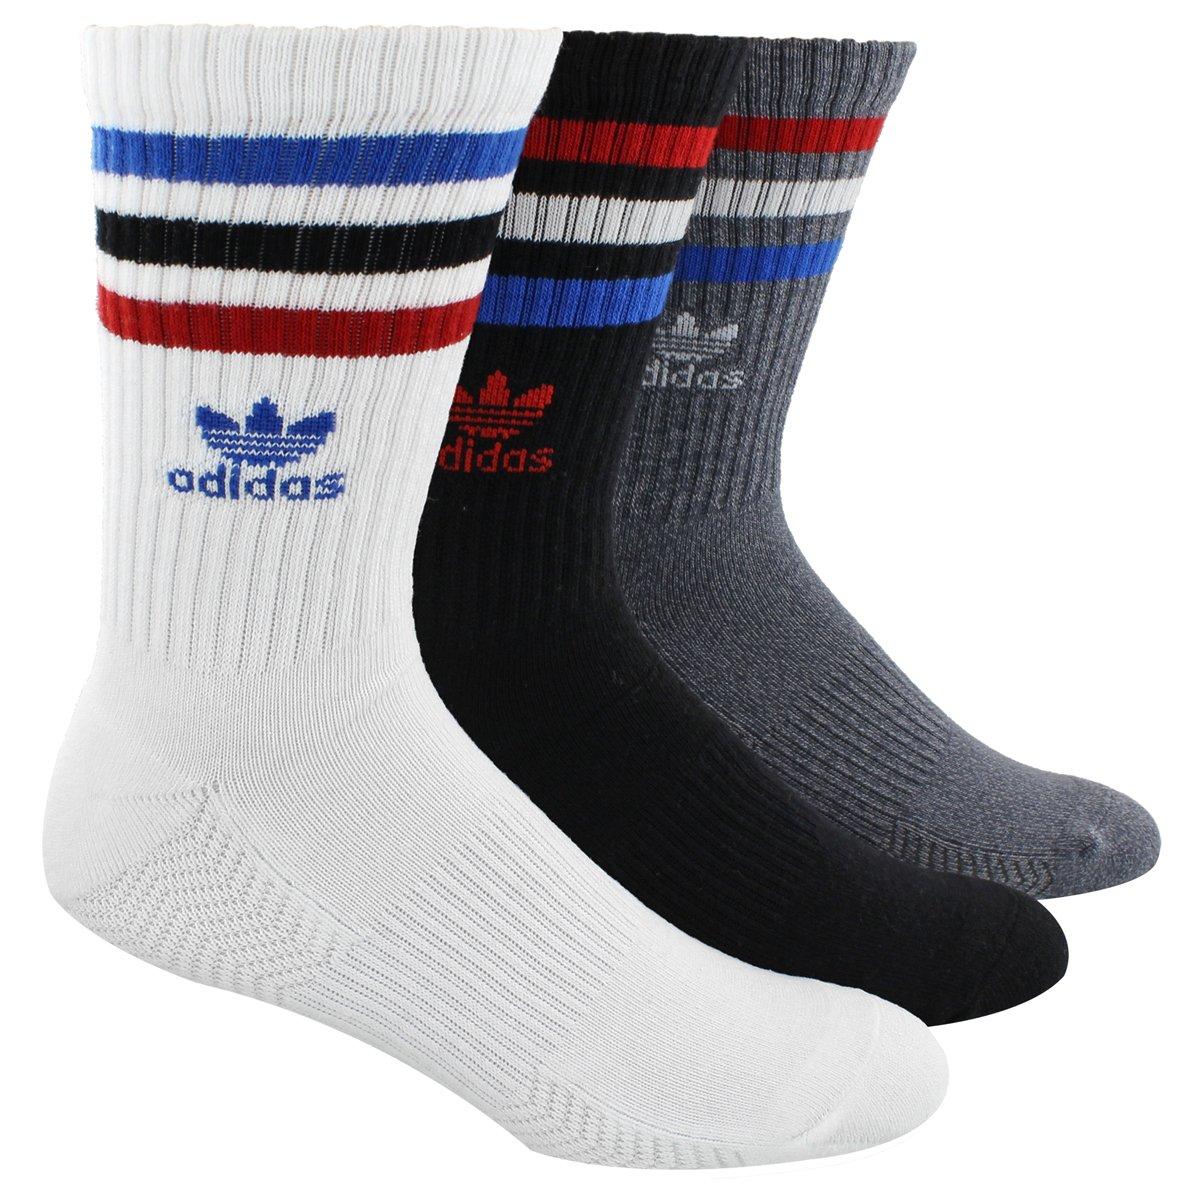 adidas Men's Originals Cushioned Crew Socks (3 Pack), White/Black/Onix Light Onix Marl/Scarlet/Blue/Black, Large